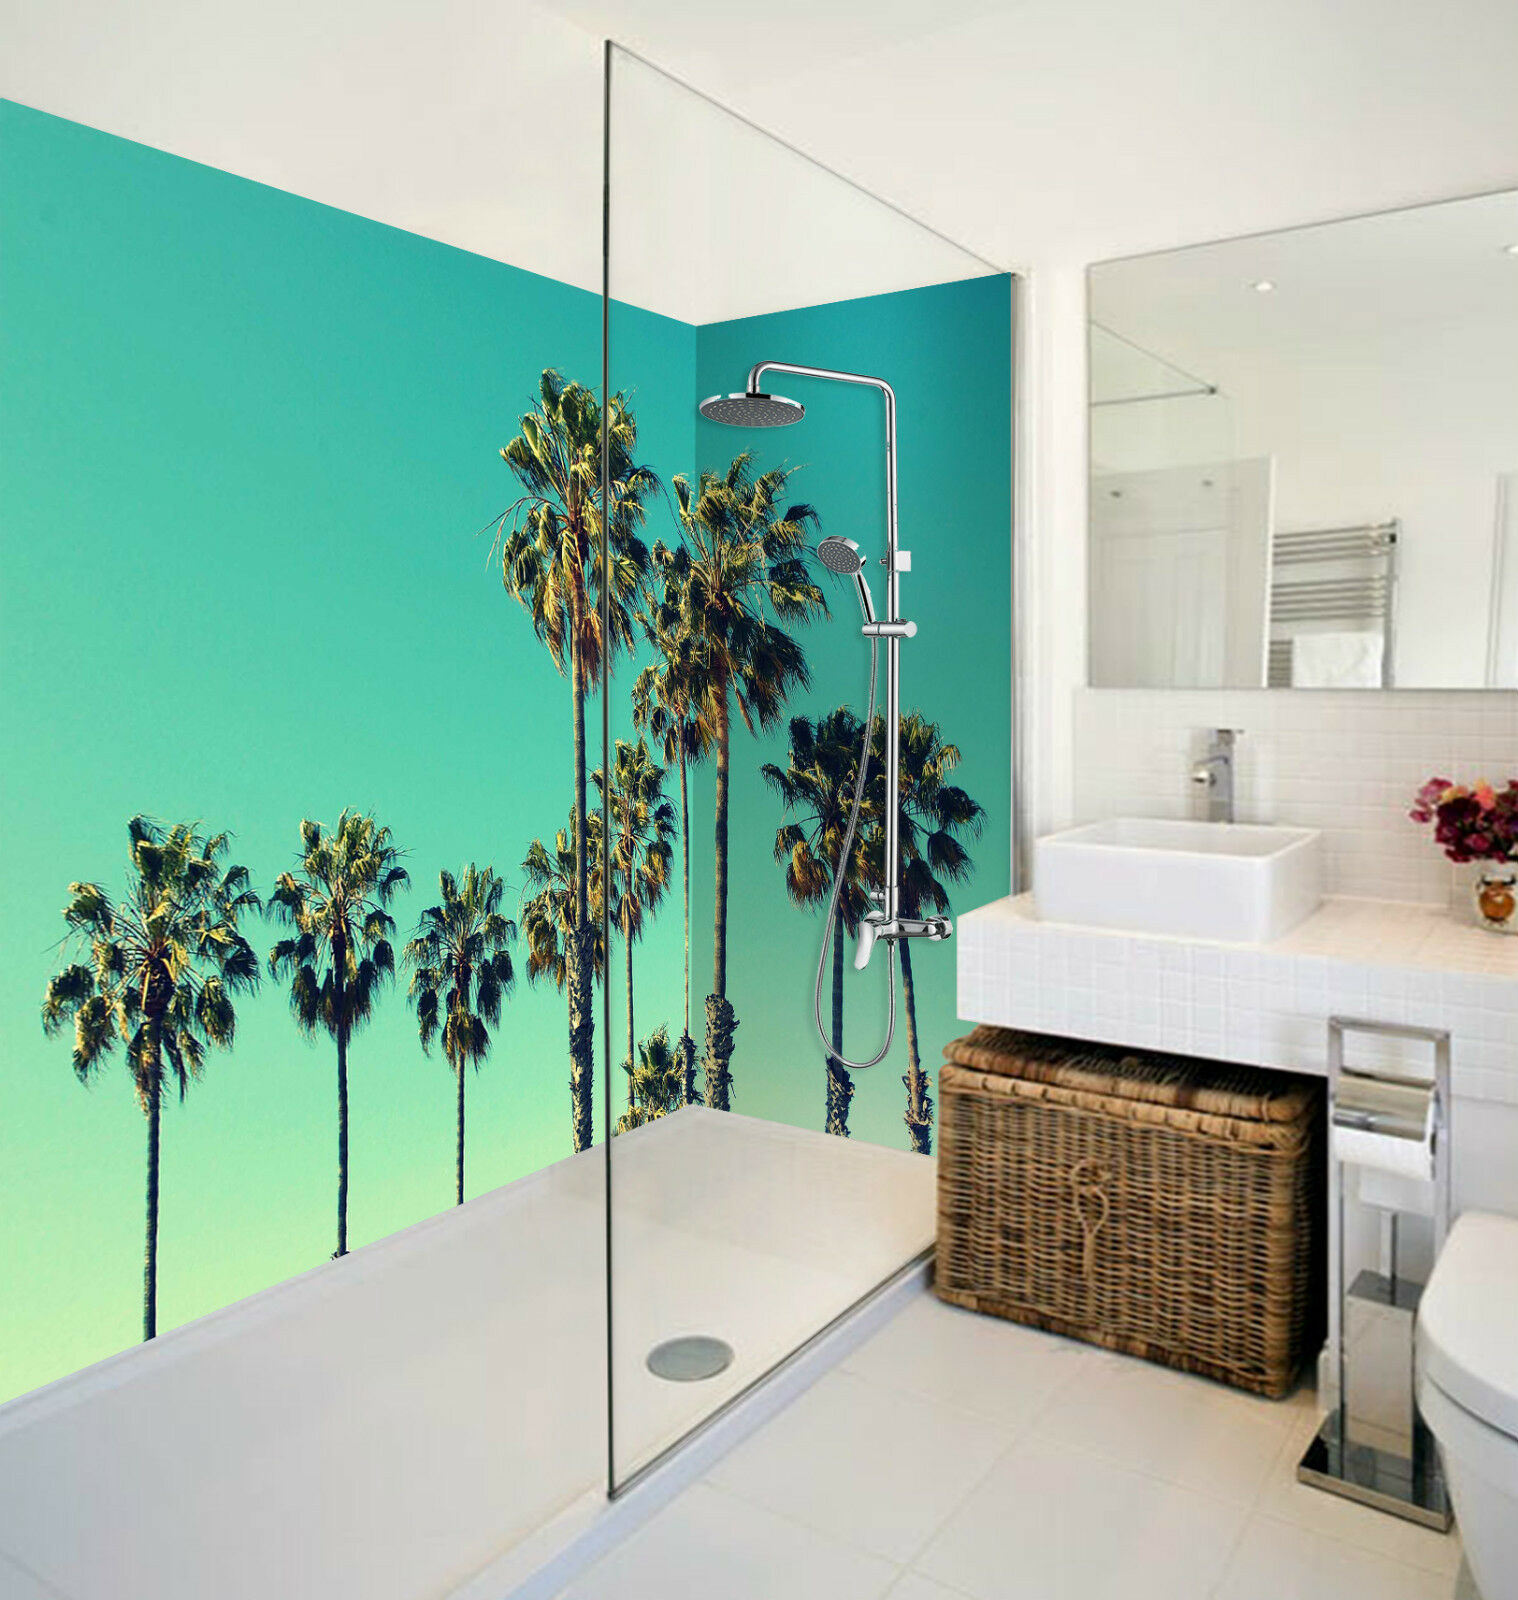 3D Tall Palm Trees 059 WallPaper Bathroom Print Decal Wall Deco AJ WALLPAPER CA